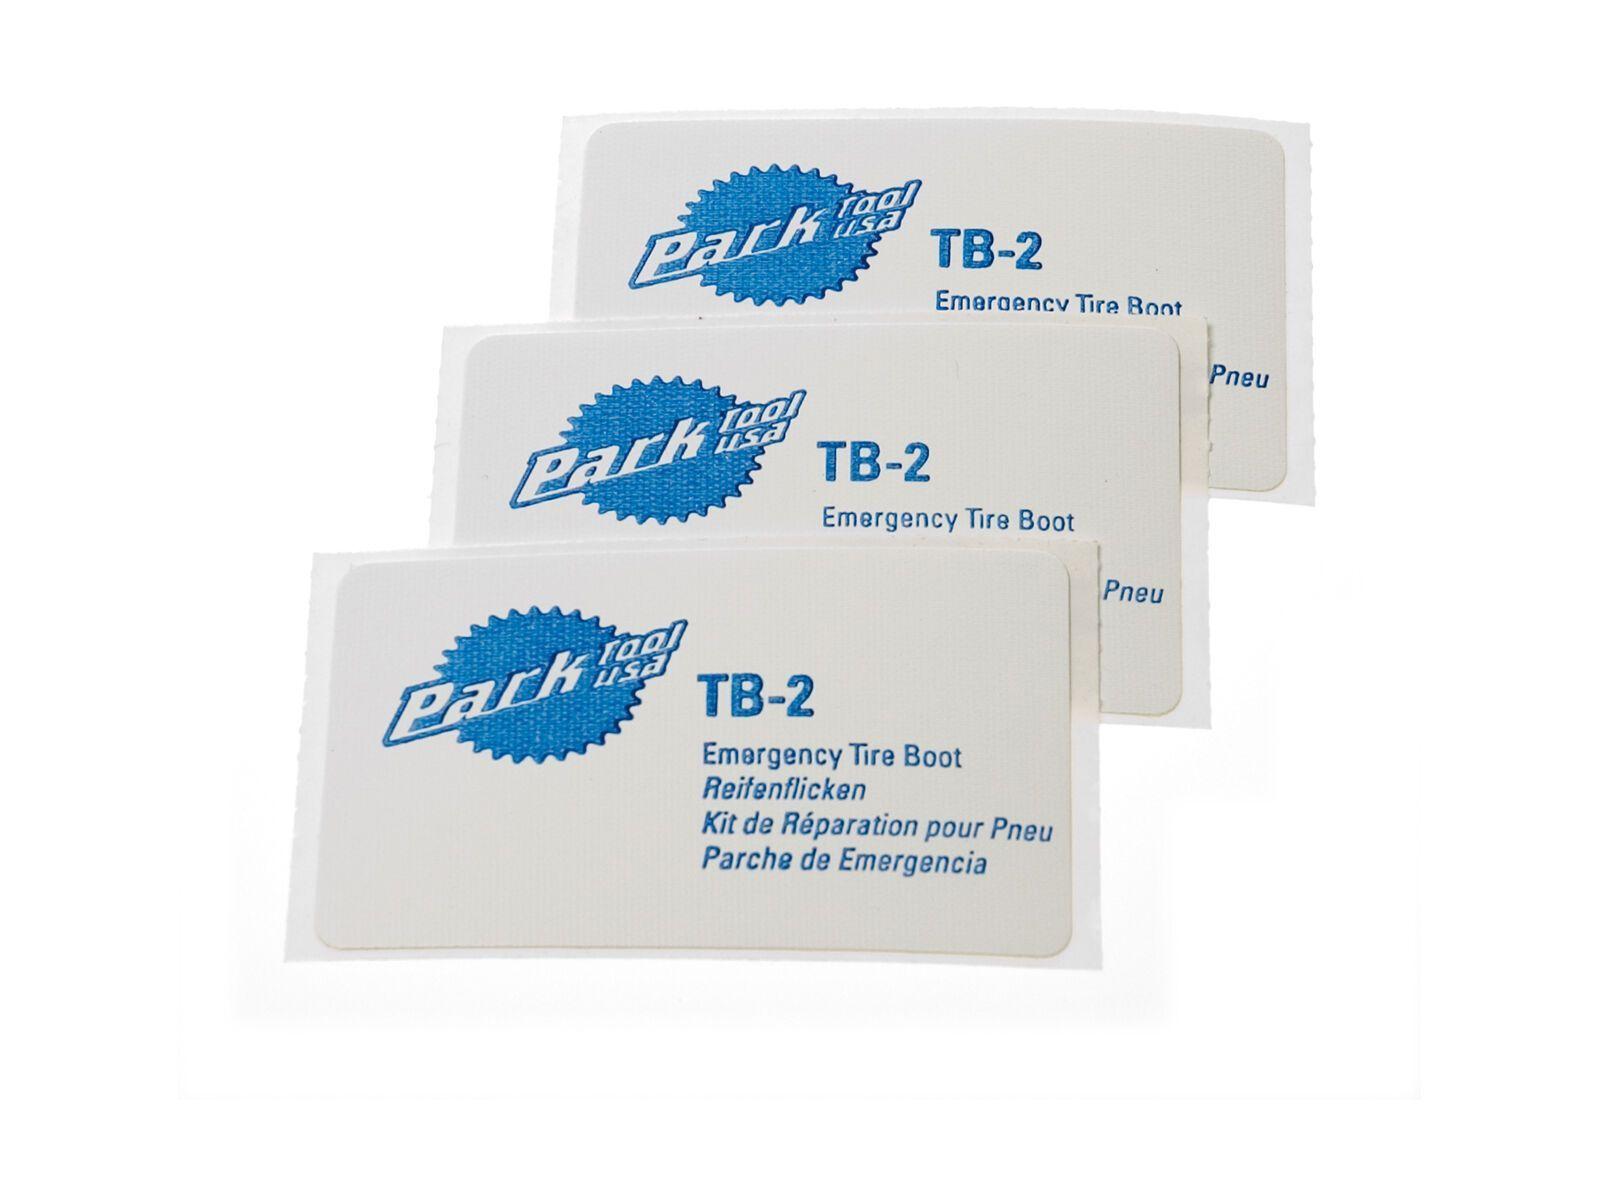 Park Tool TB-2 Emergency Tire Boots / Reifenflicken - Flickzeug 4000221